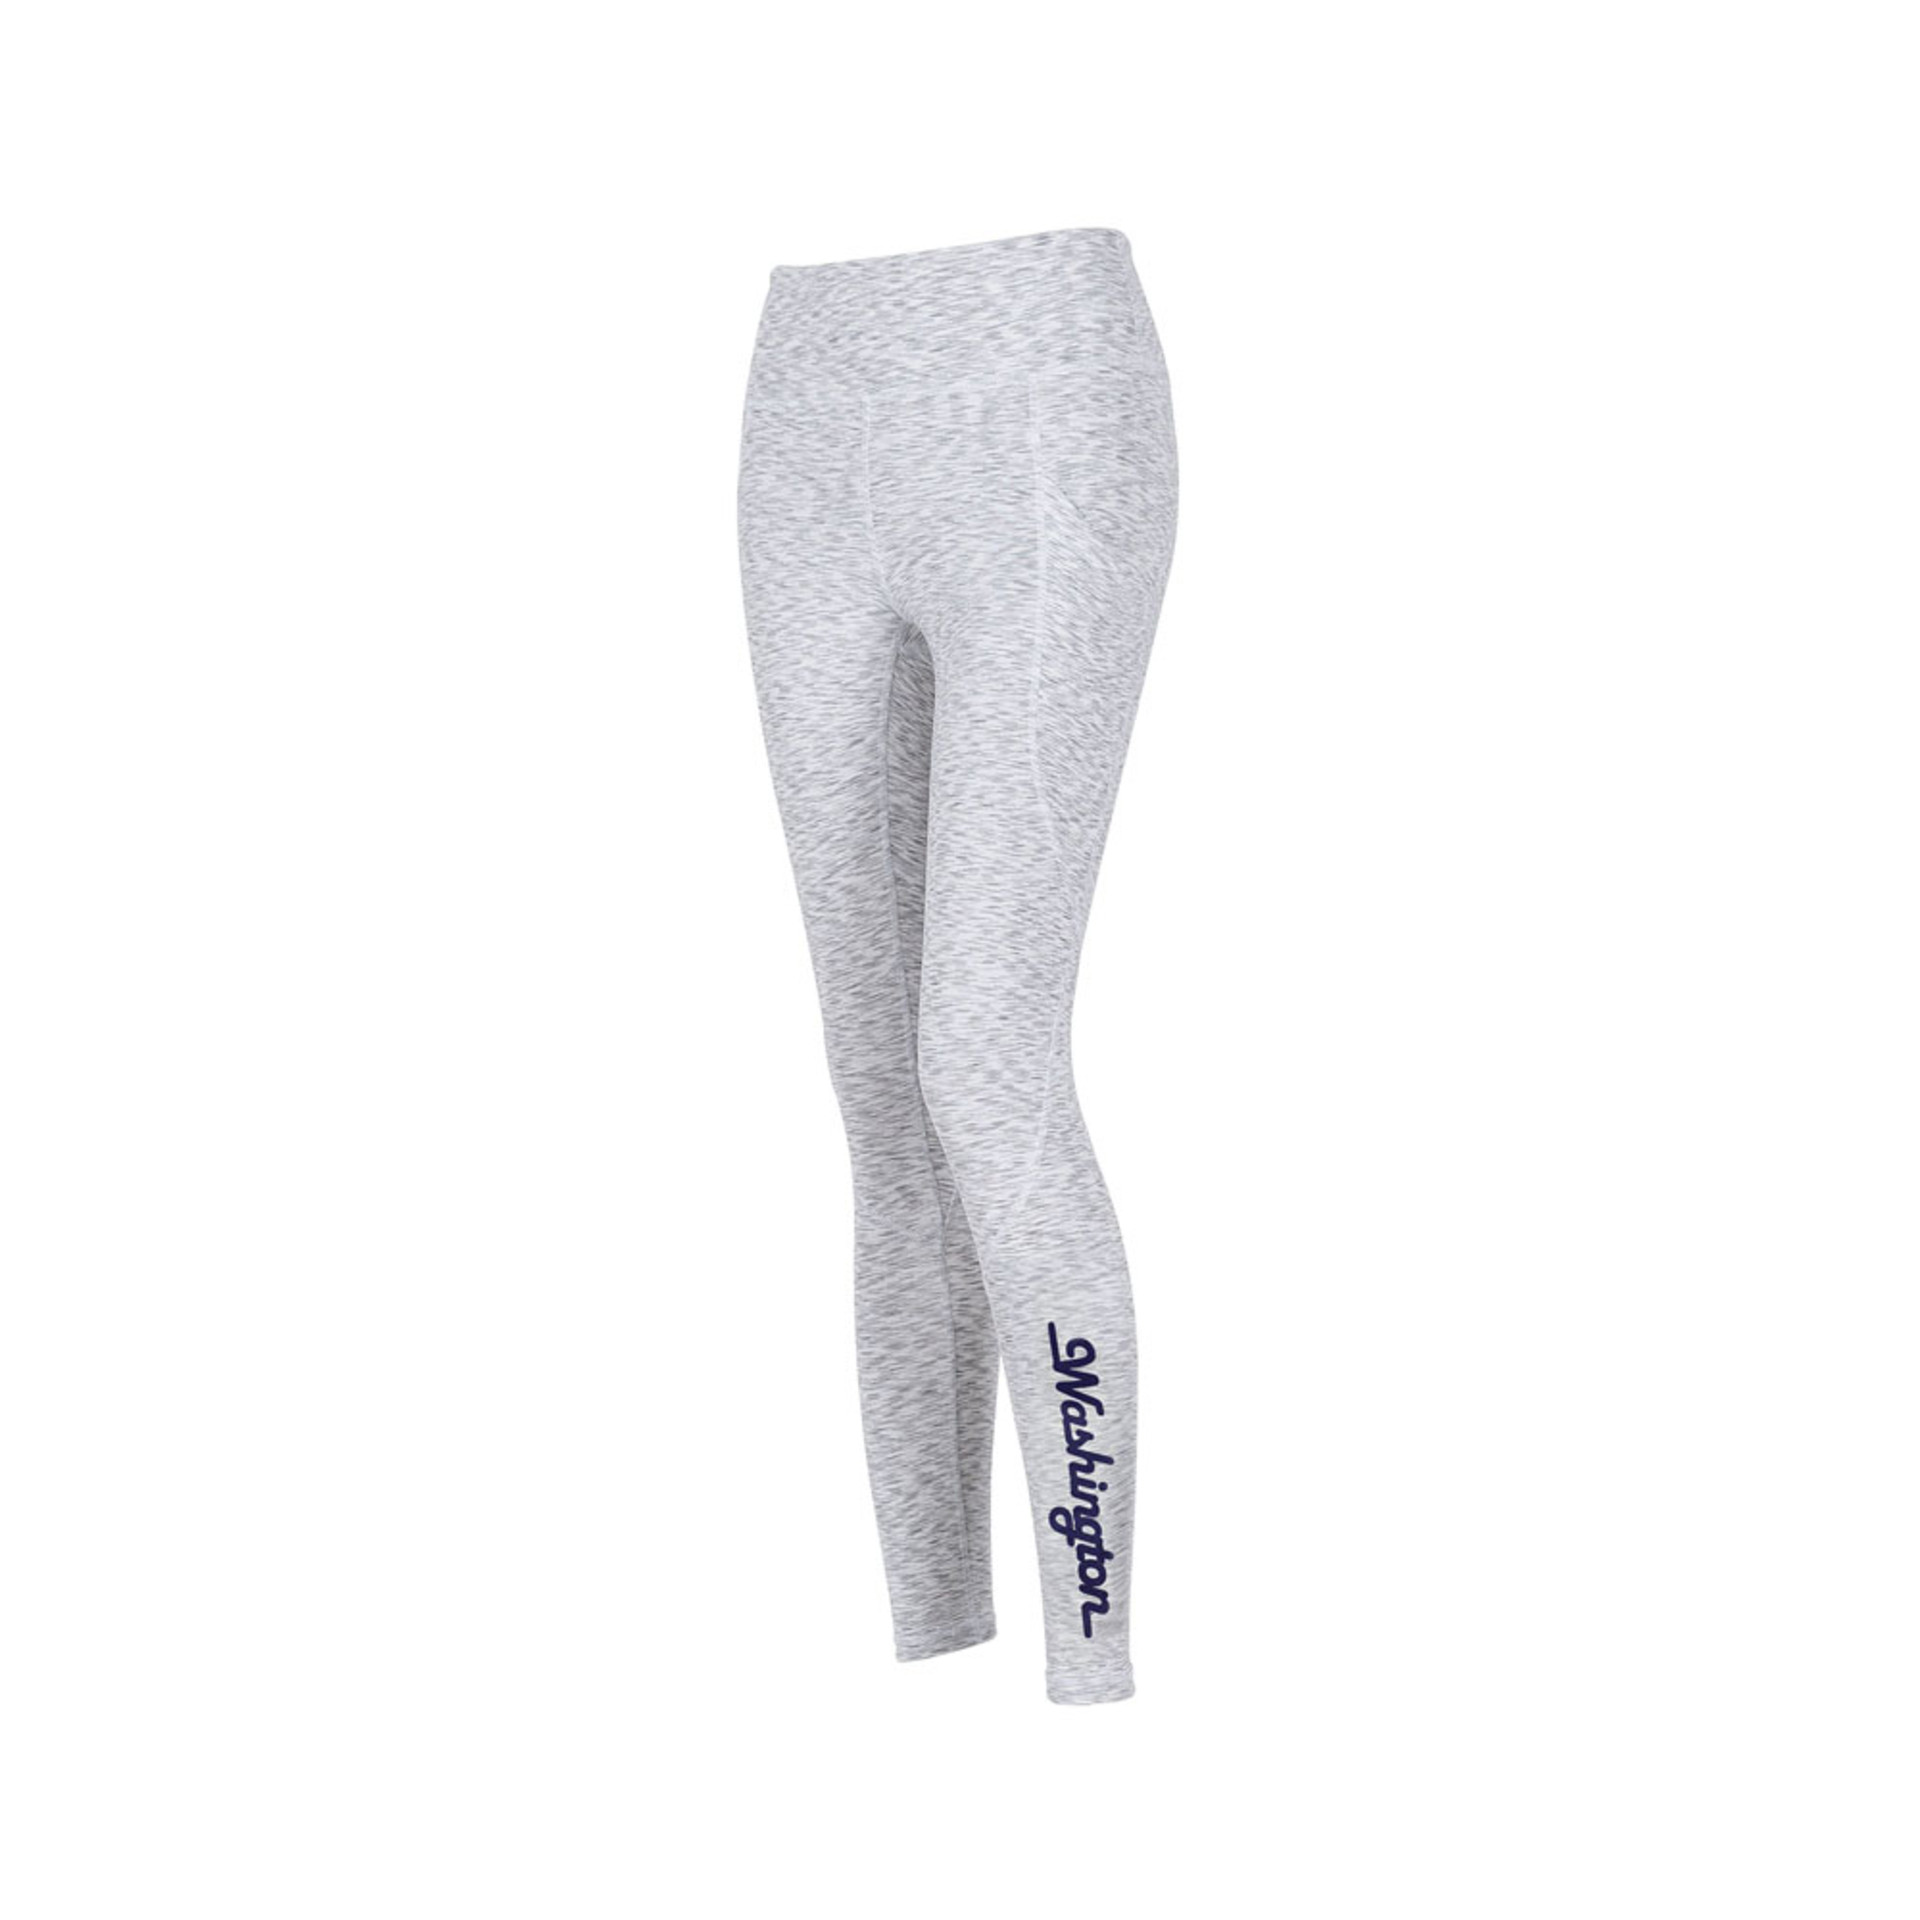 Zoozatz Women's Washington Pocket Legging – White